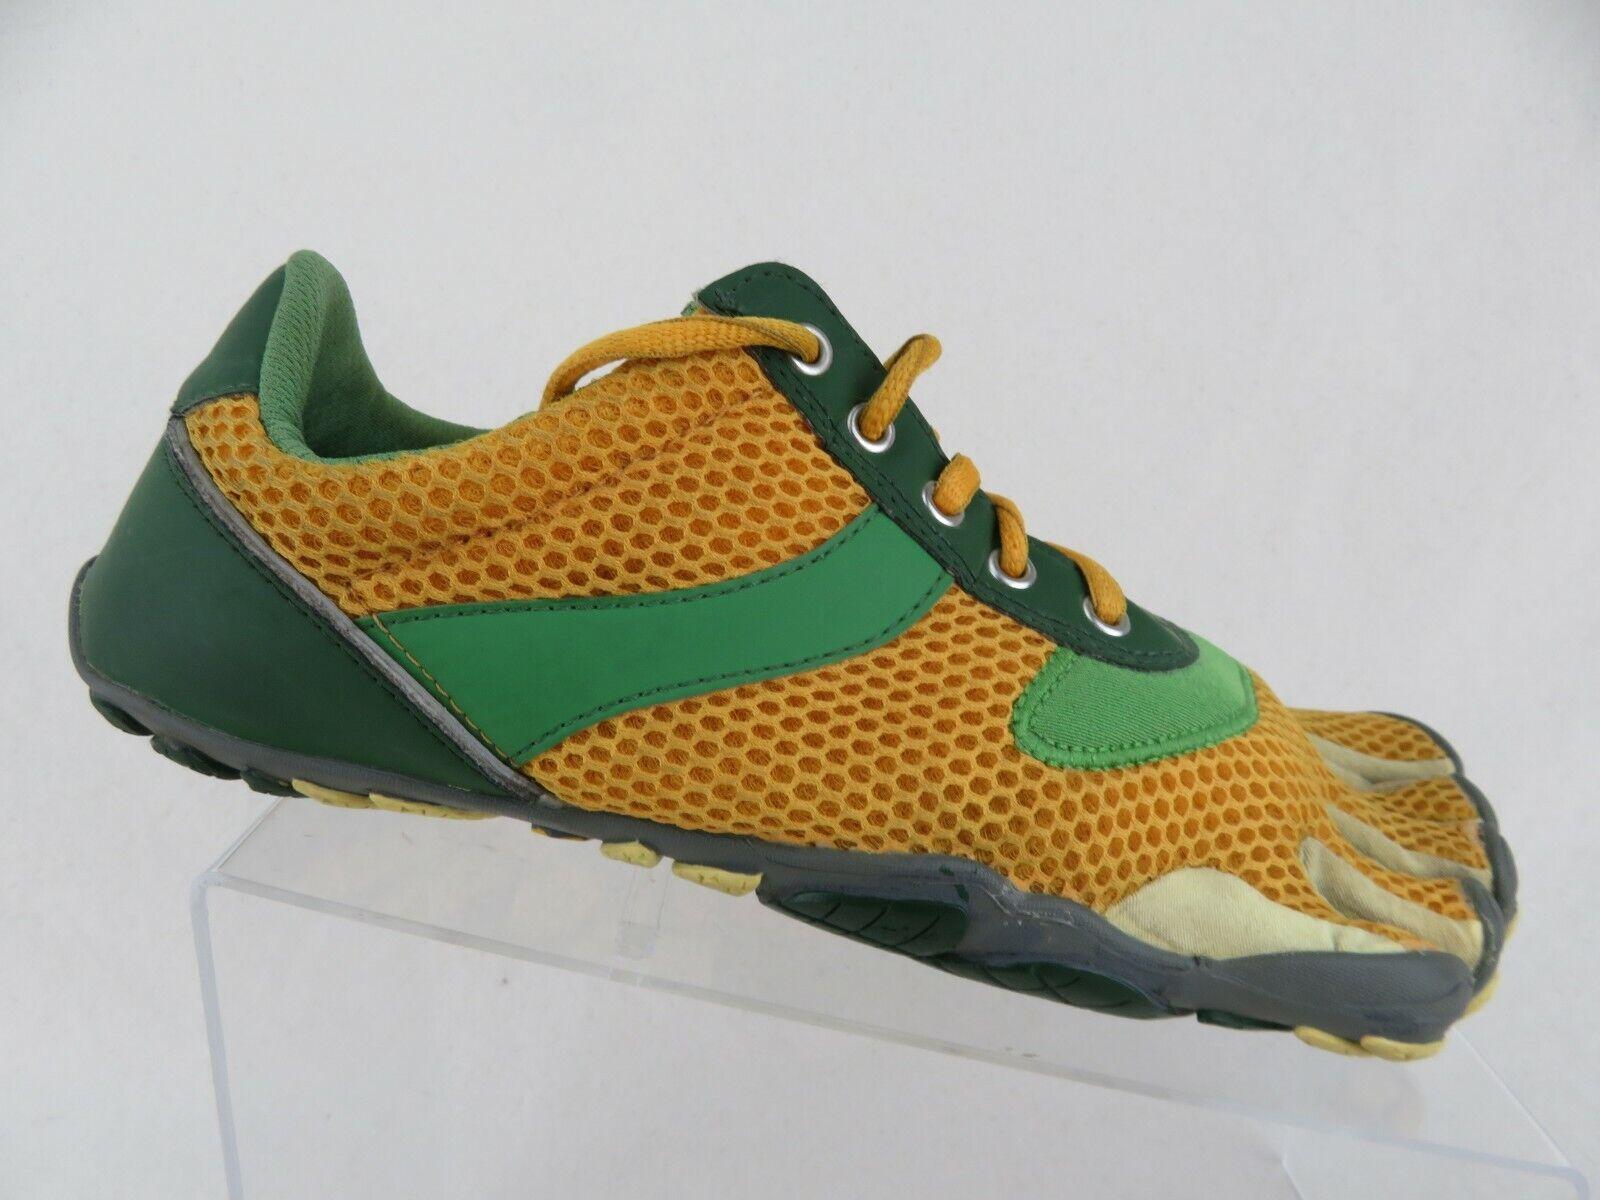 VIBRAM Fivefingers Speed encaje oro verde Z 10 (43 EU) Hombre Barefoot Zapatillas